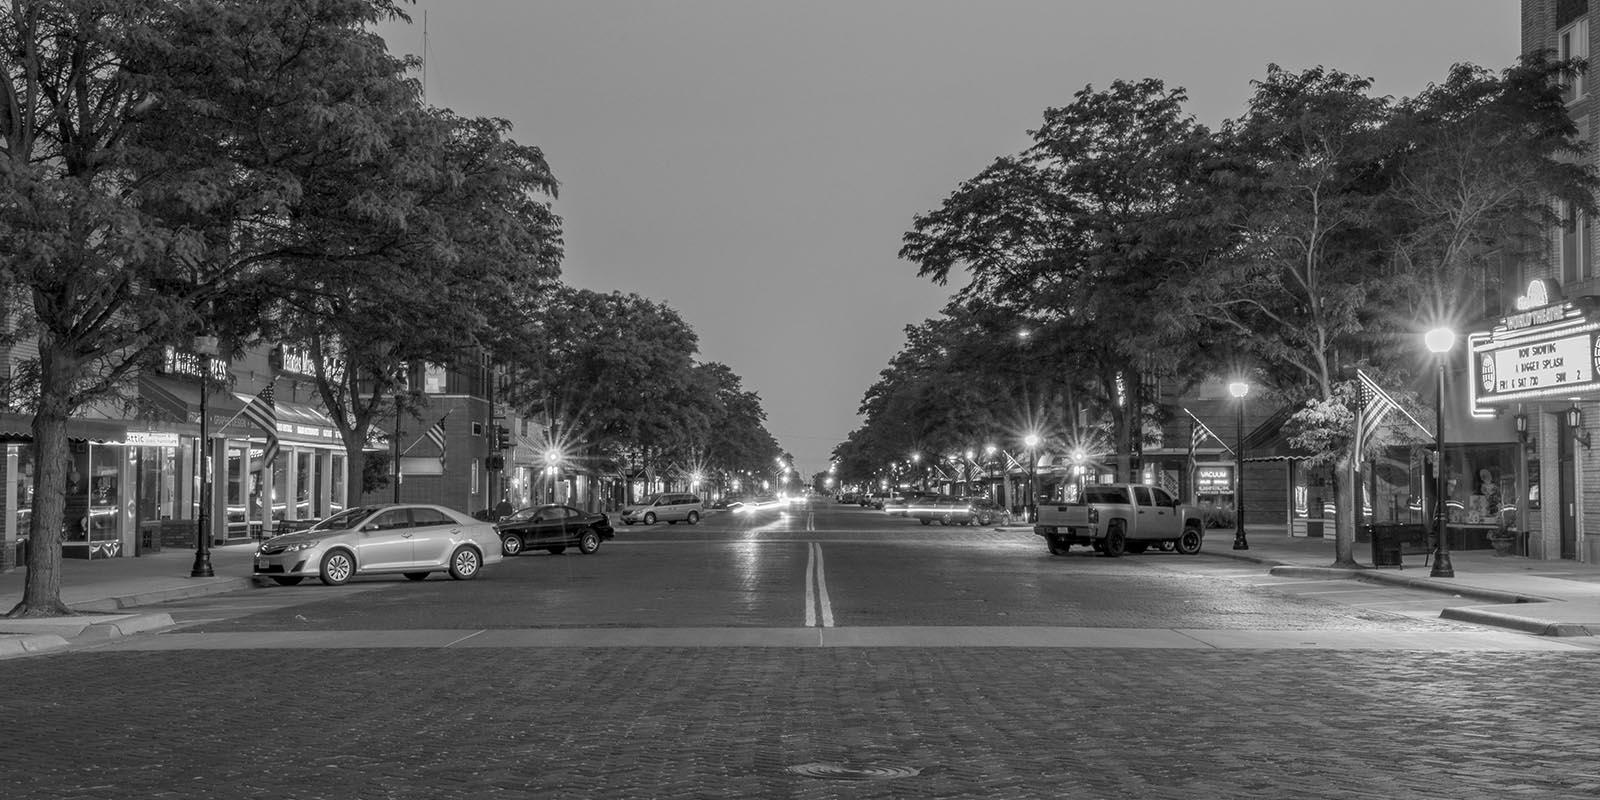 Main street in a small Nebraska town